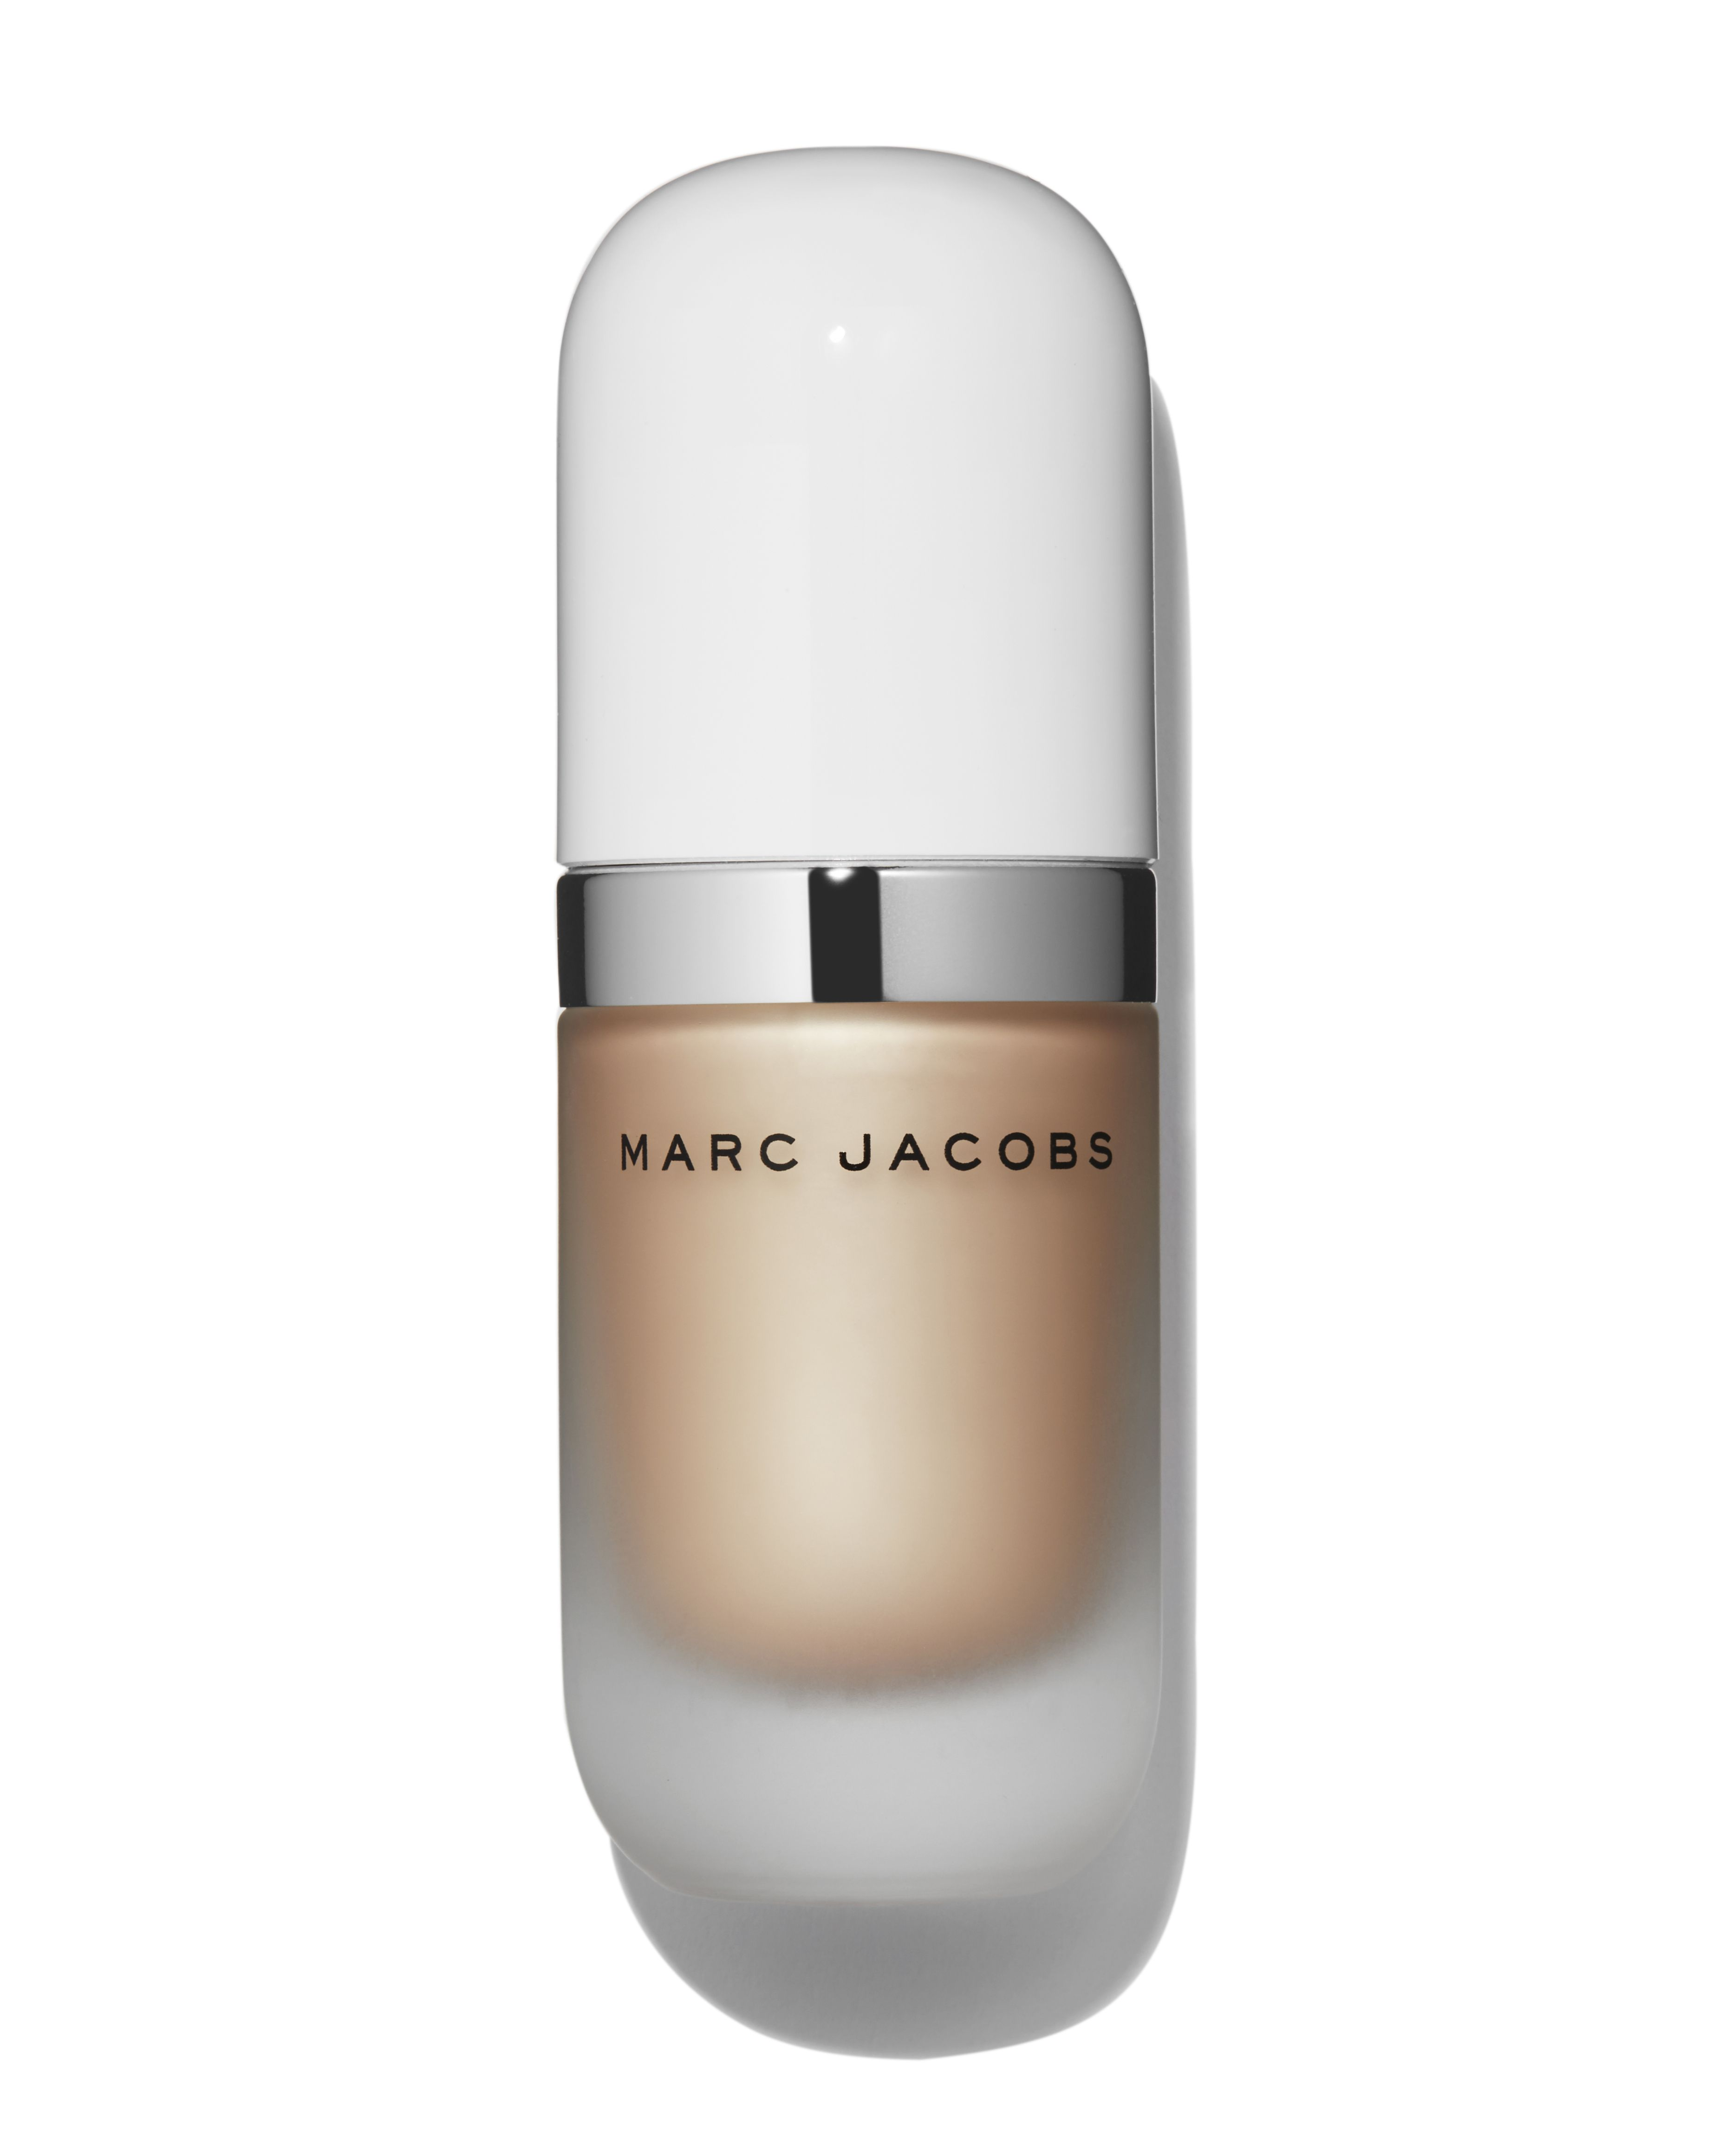 Marc Jacobs Coconut Gel Highlighter